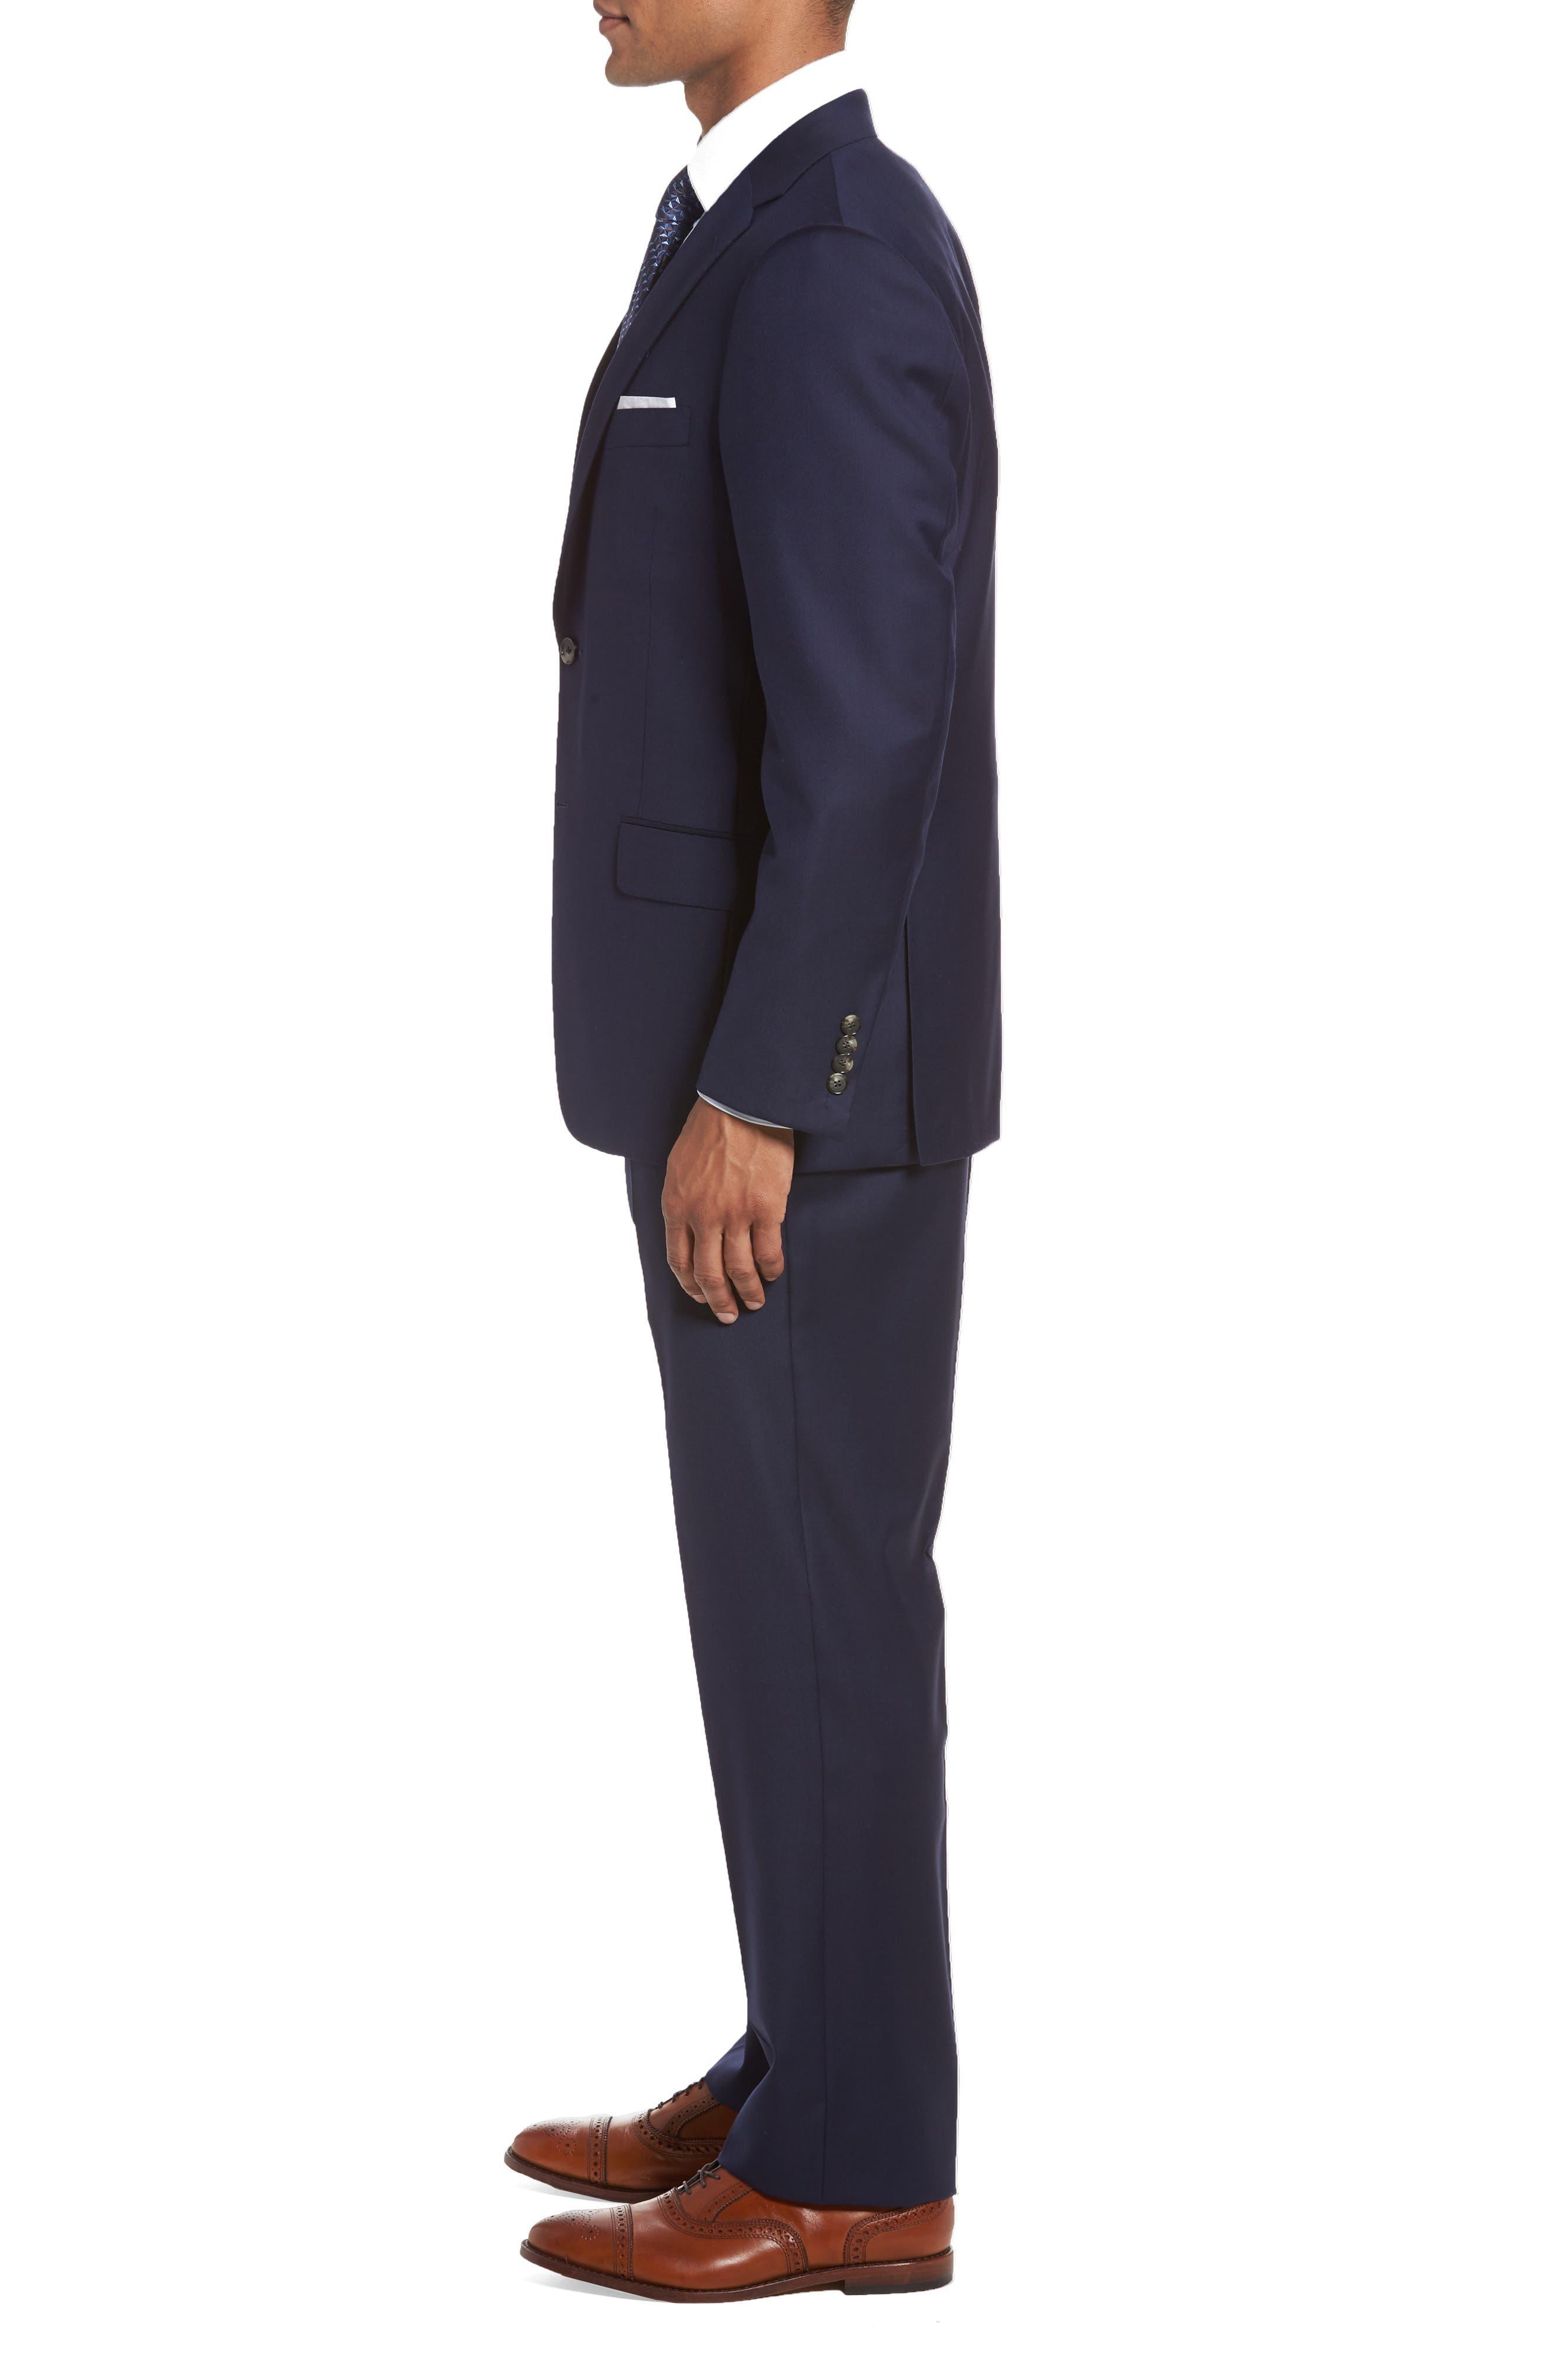 HICKEY FREEMAN, Classic B Fit Loro Piana Wool Suit, Alternate thumbnail 3, color, NAVY